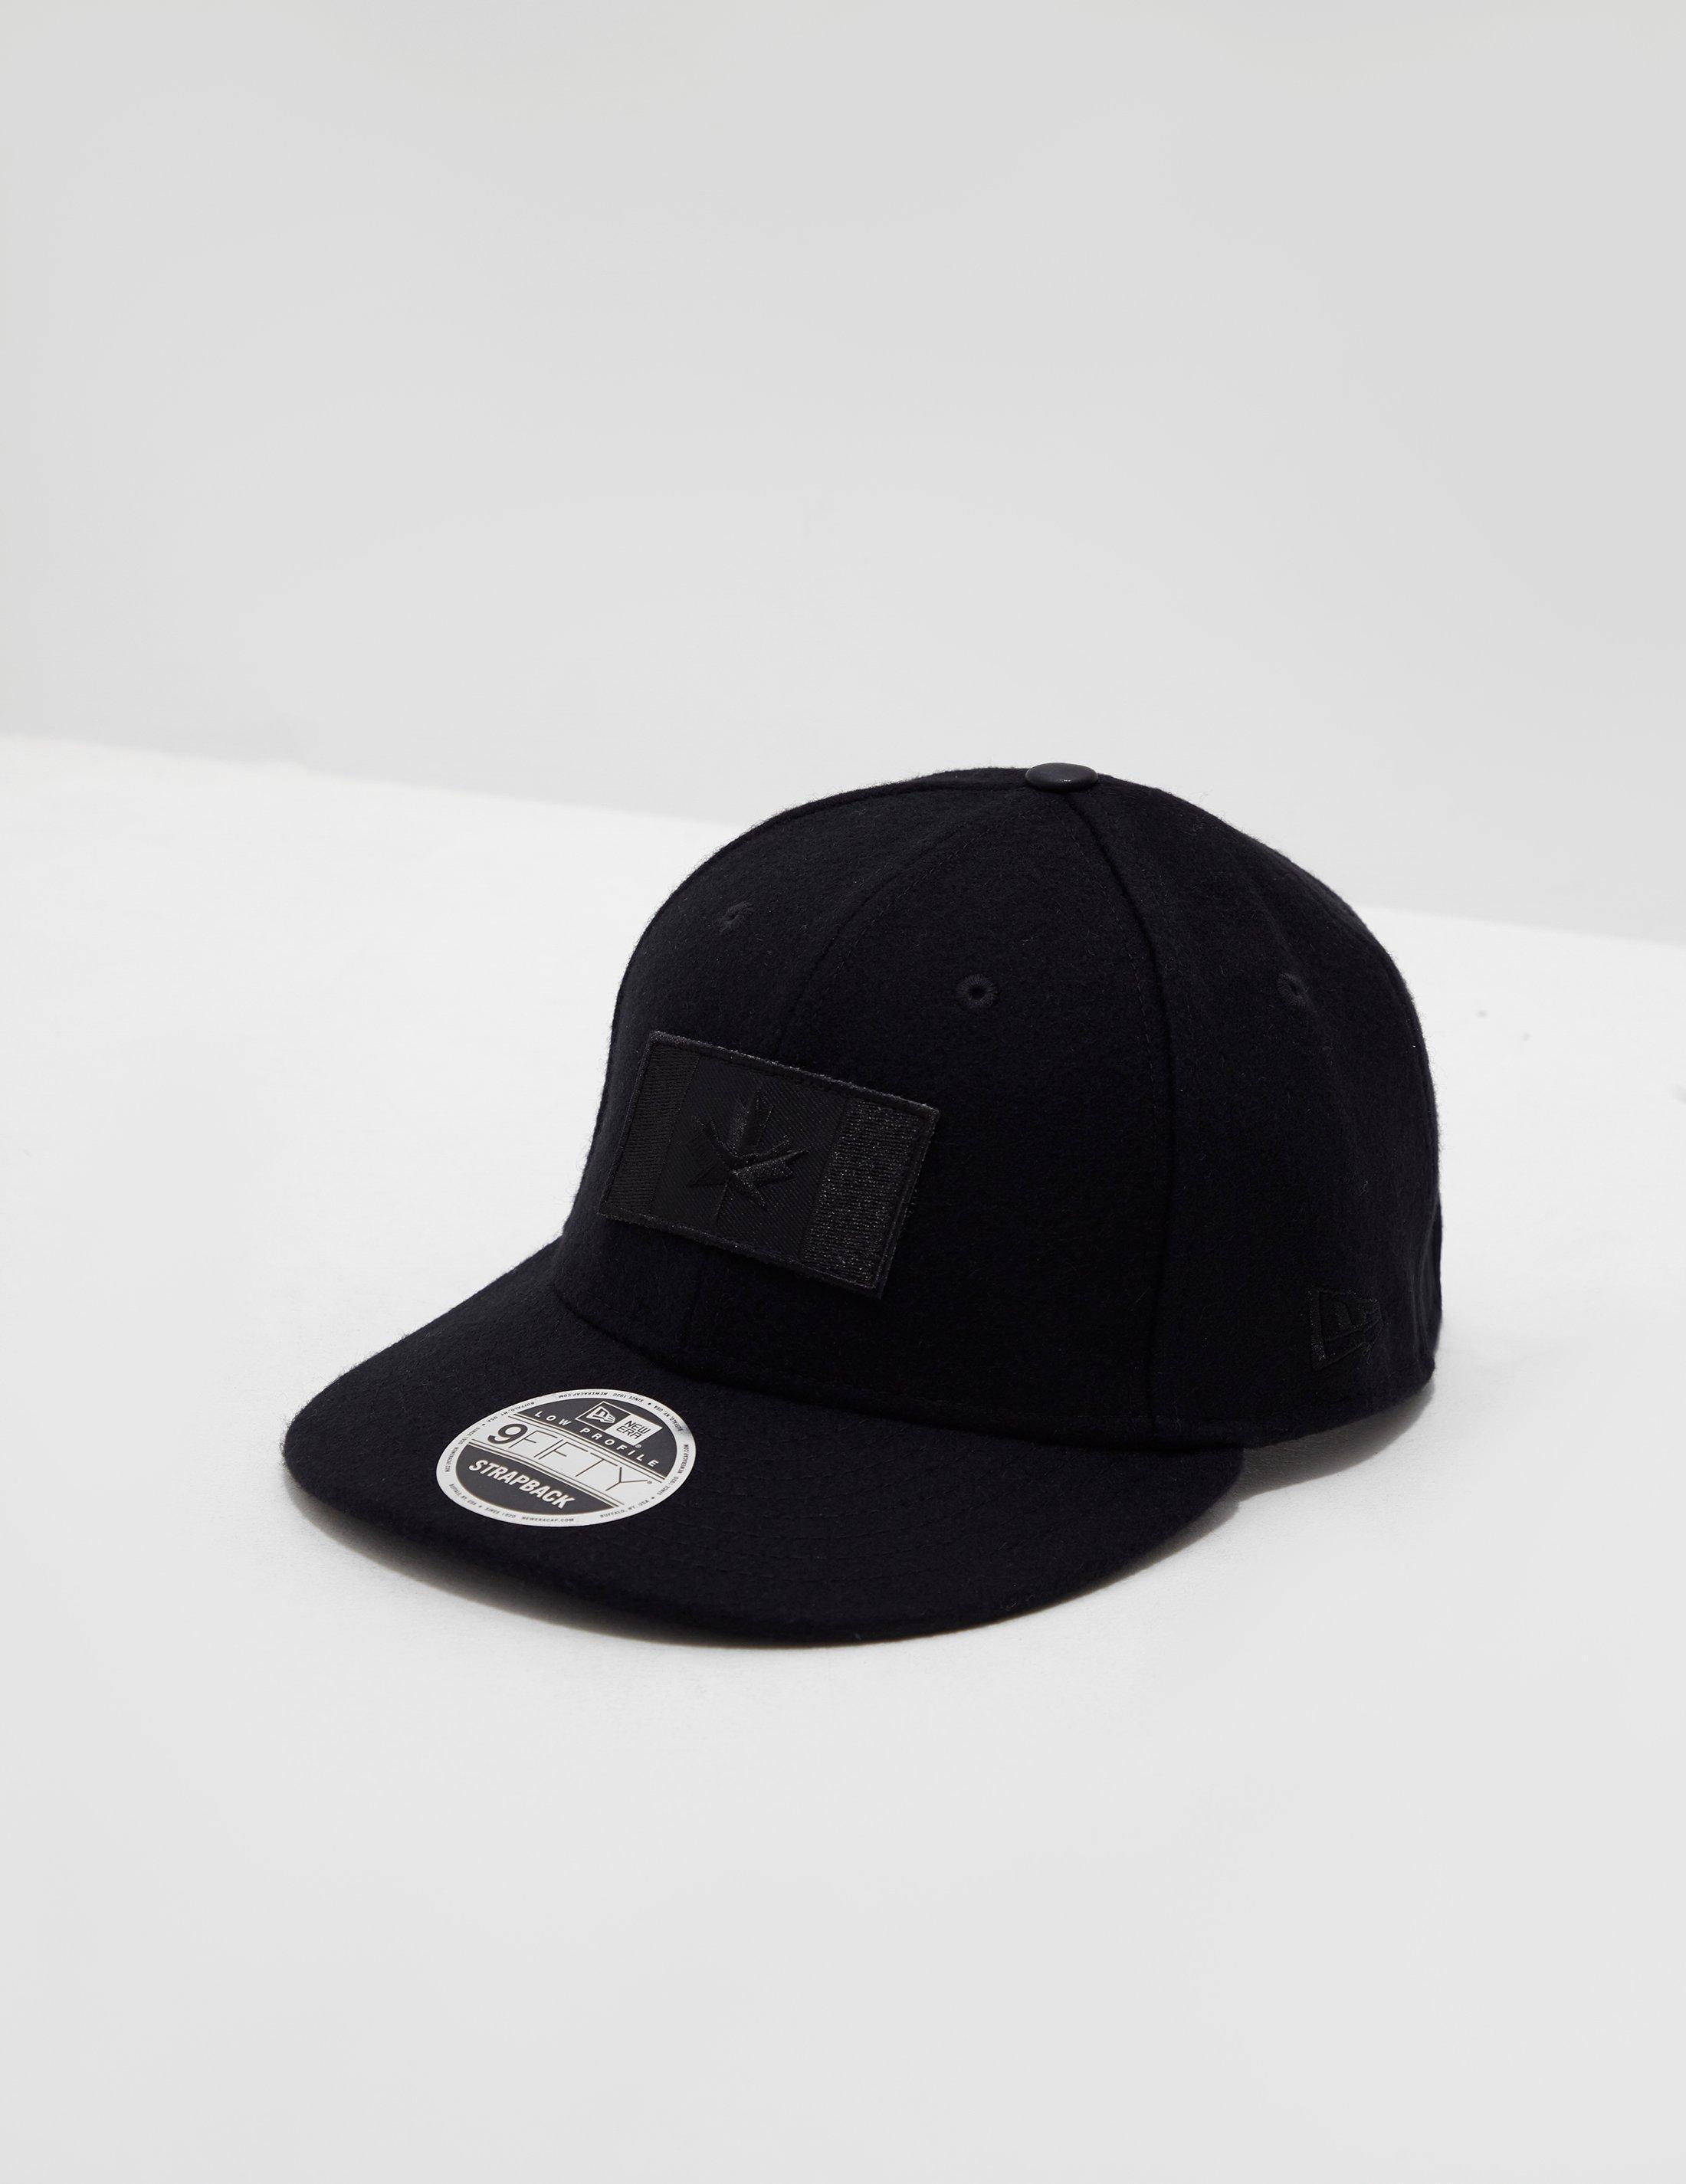 f3457857d9a Lyst - Canada Goose Wool Cap Black in Black for Men